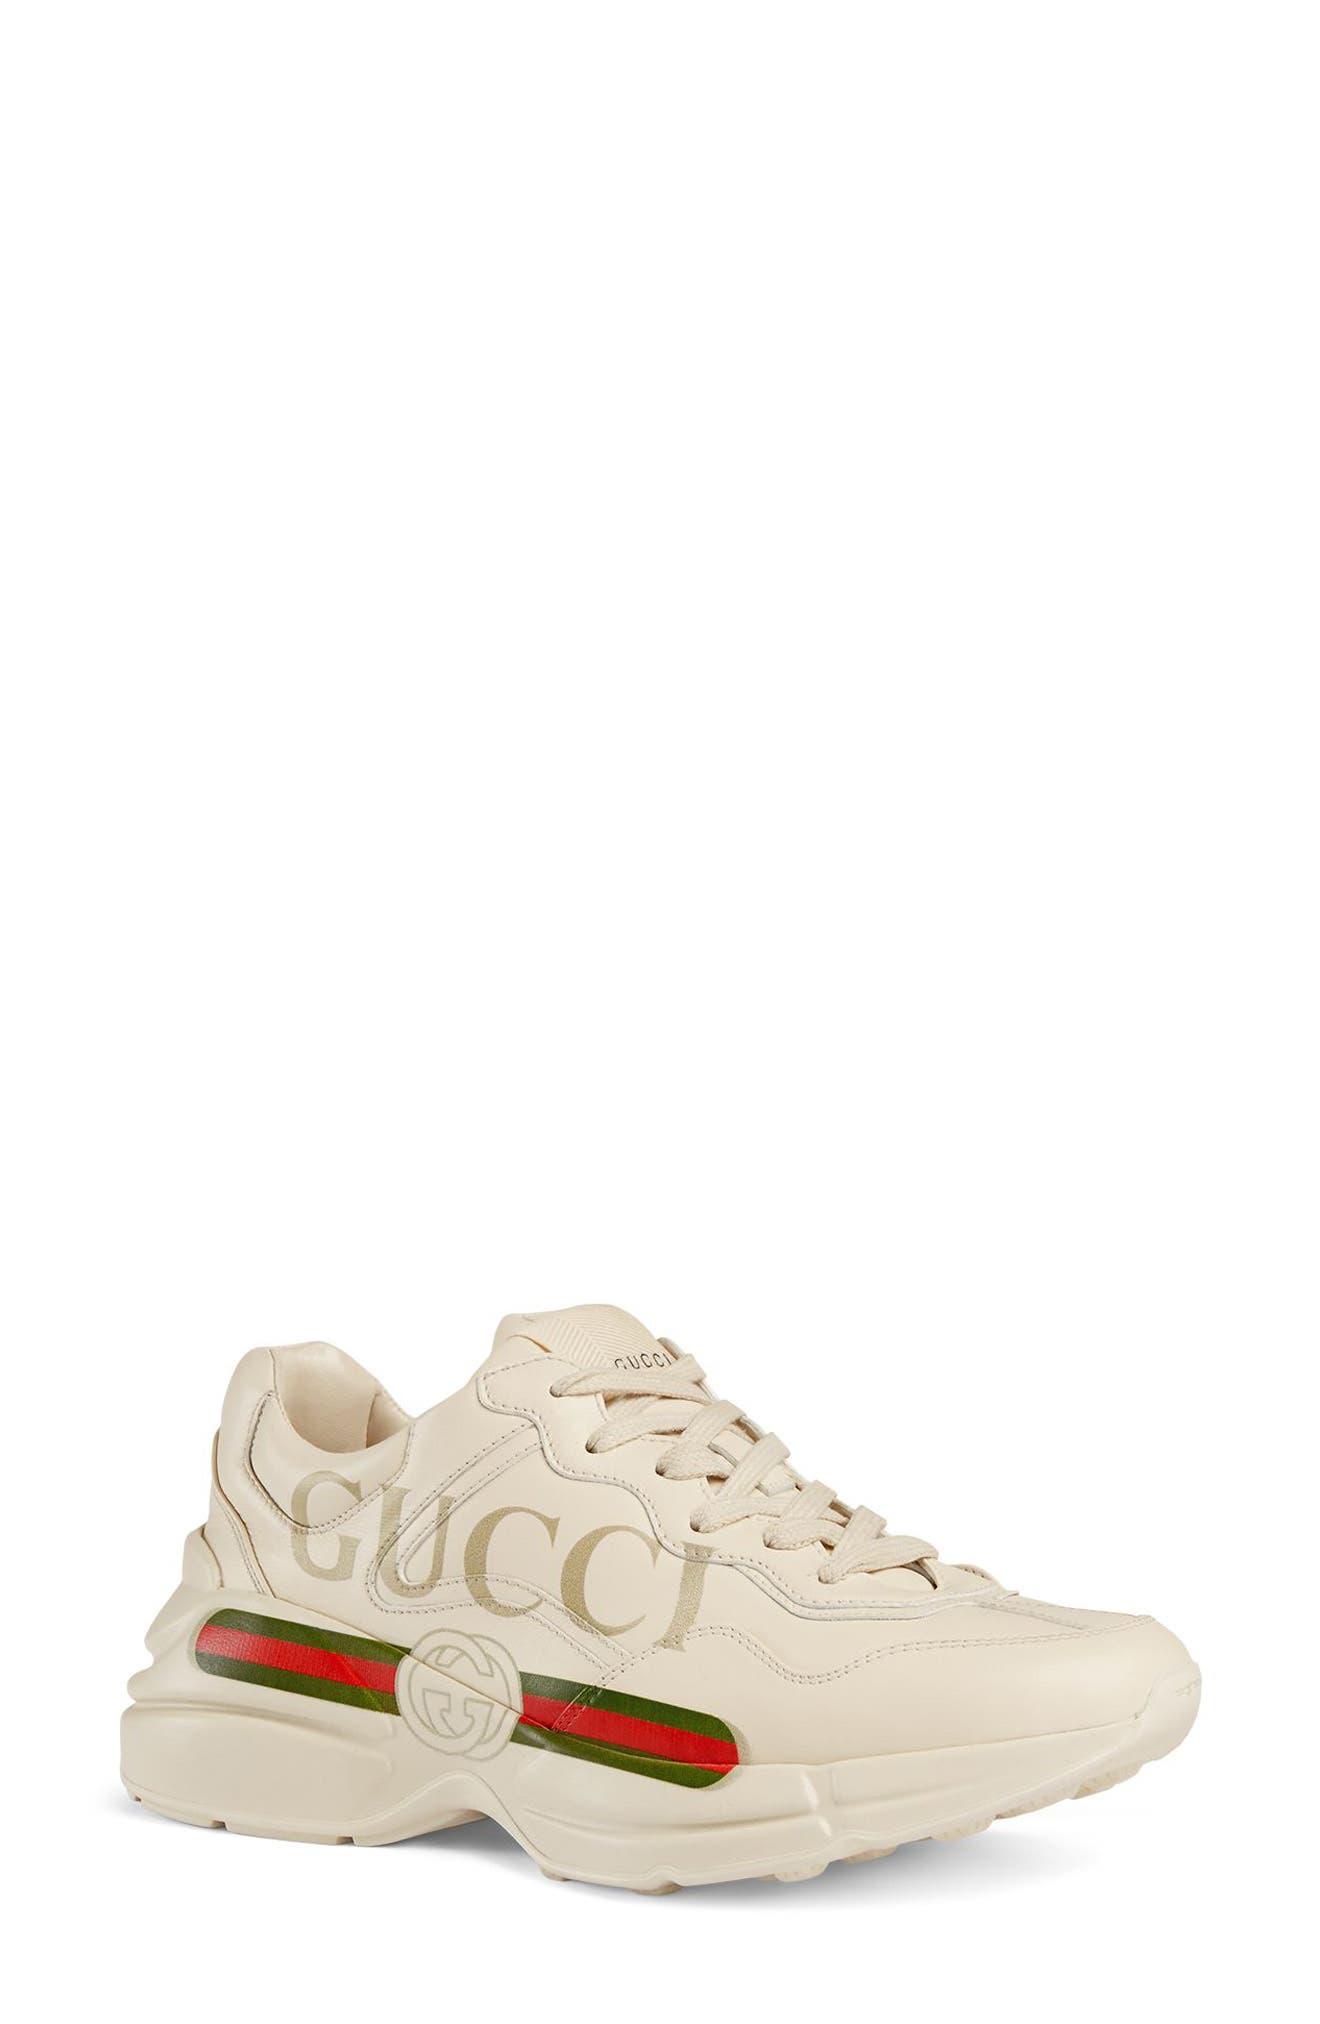 Gucci Rhyton Logo Sneaker - Ivory